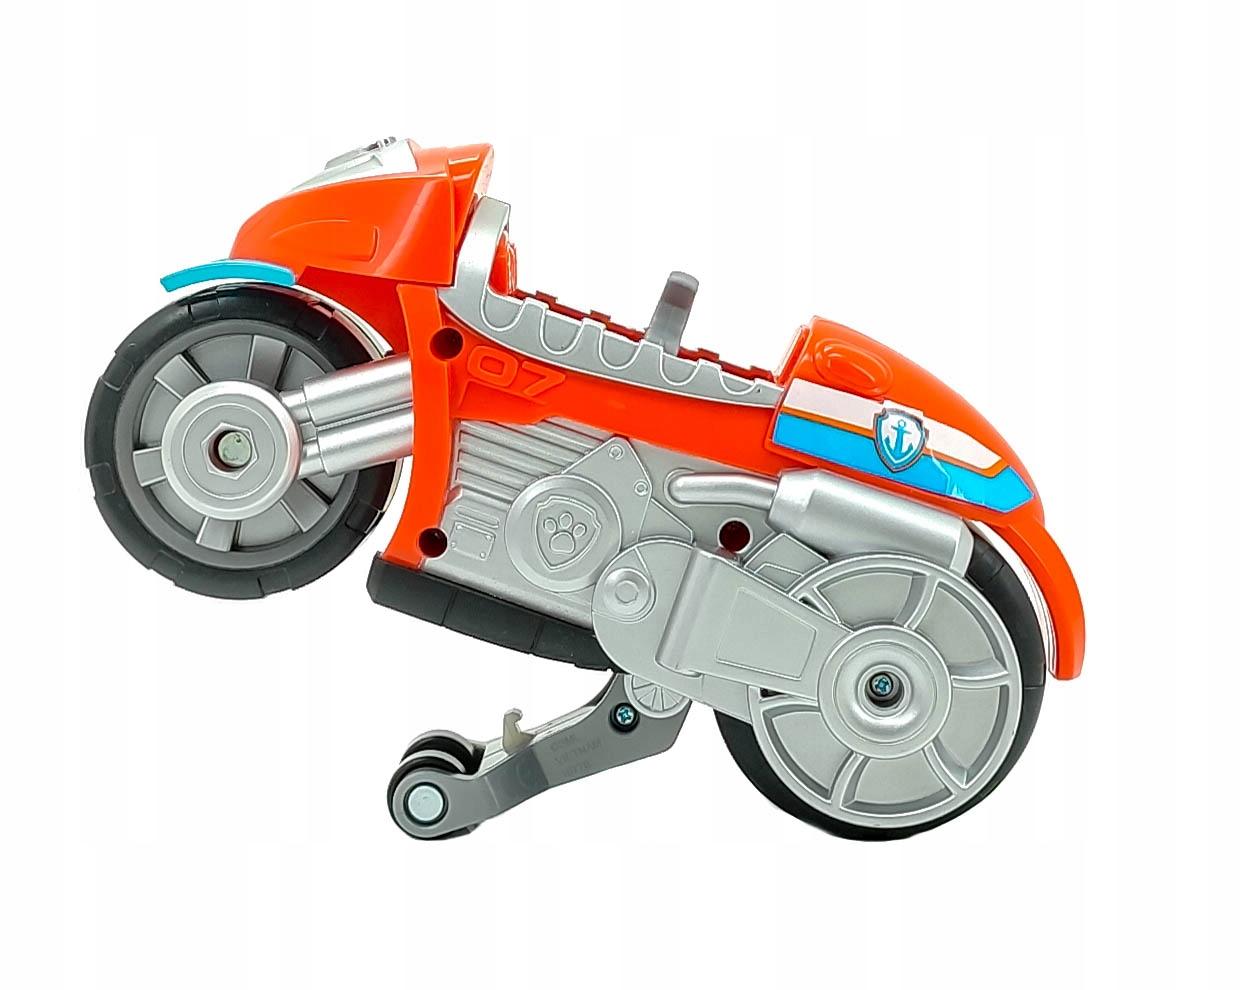 PSI PATROL ZUMA FIGURKA I MOTOCYKL MOTO PUPS EAN 778988330425